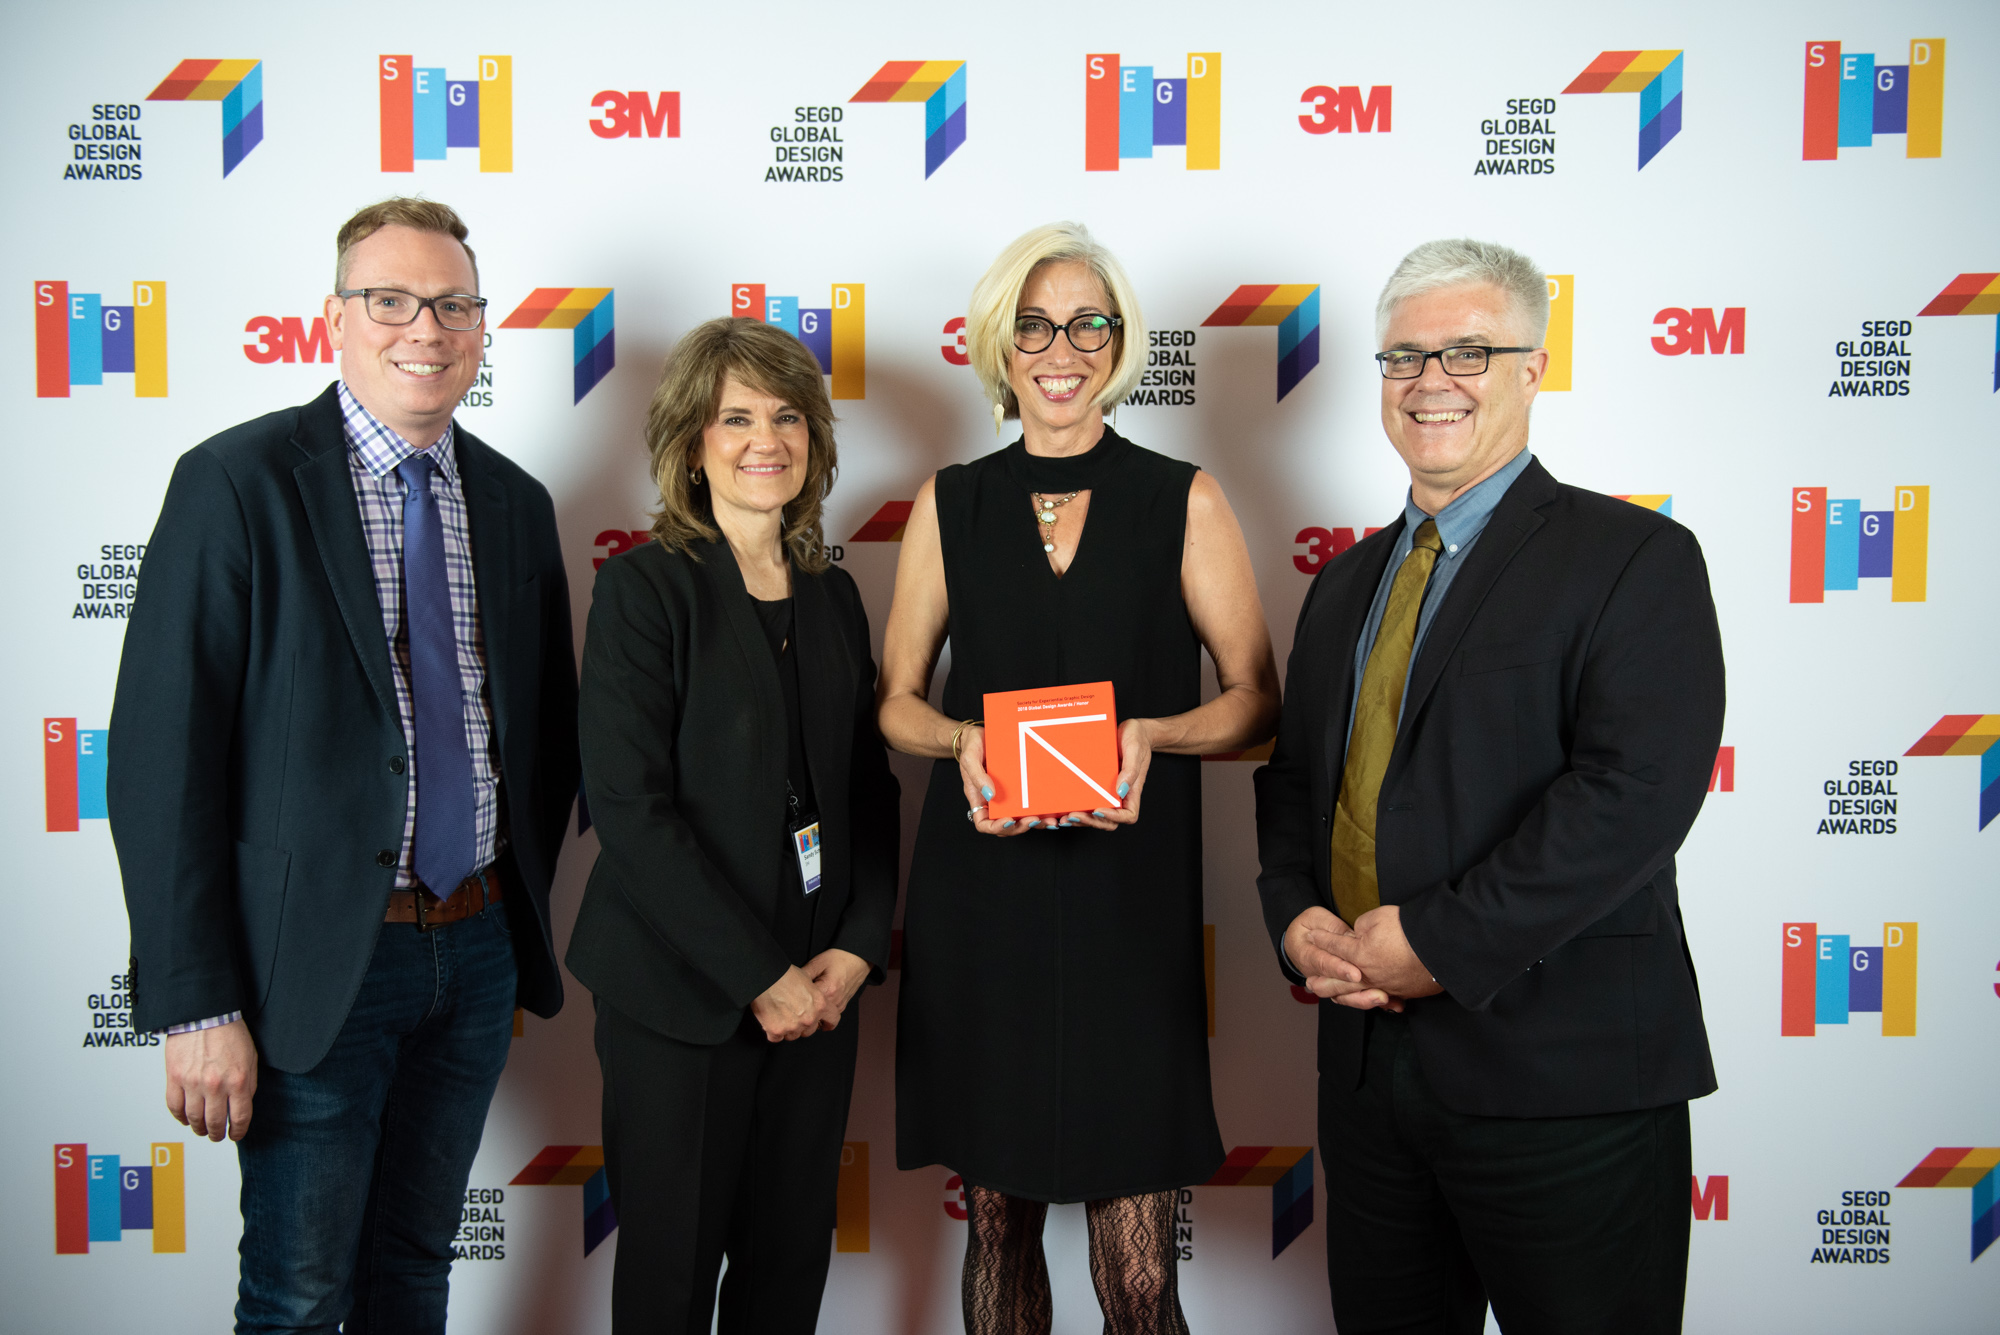 denver_rtd_2018-Global-Design-Awards-Ceremony-56-.jpg